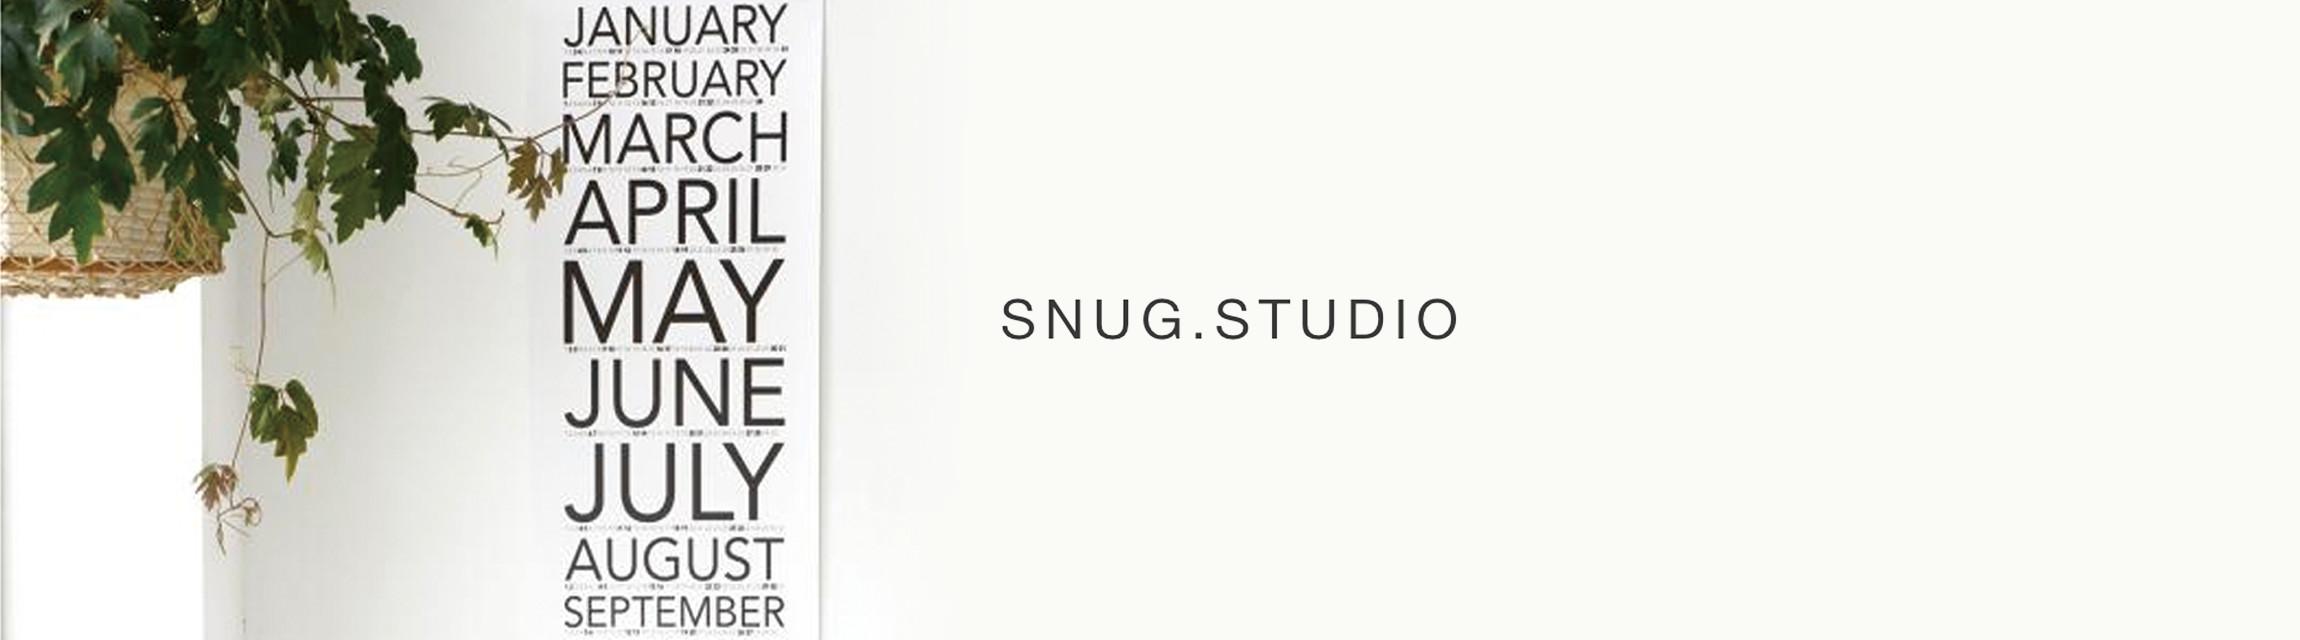 SNUG.STUDIO(スナッグスタジオ)